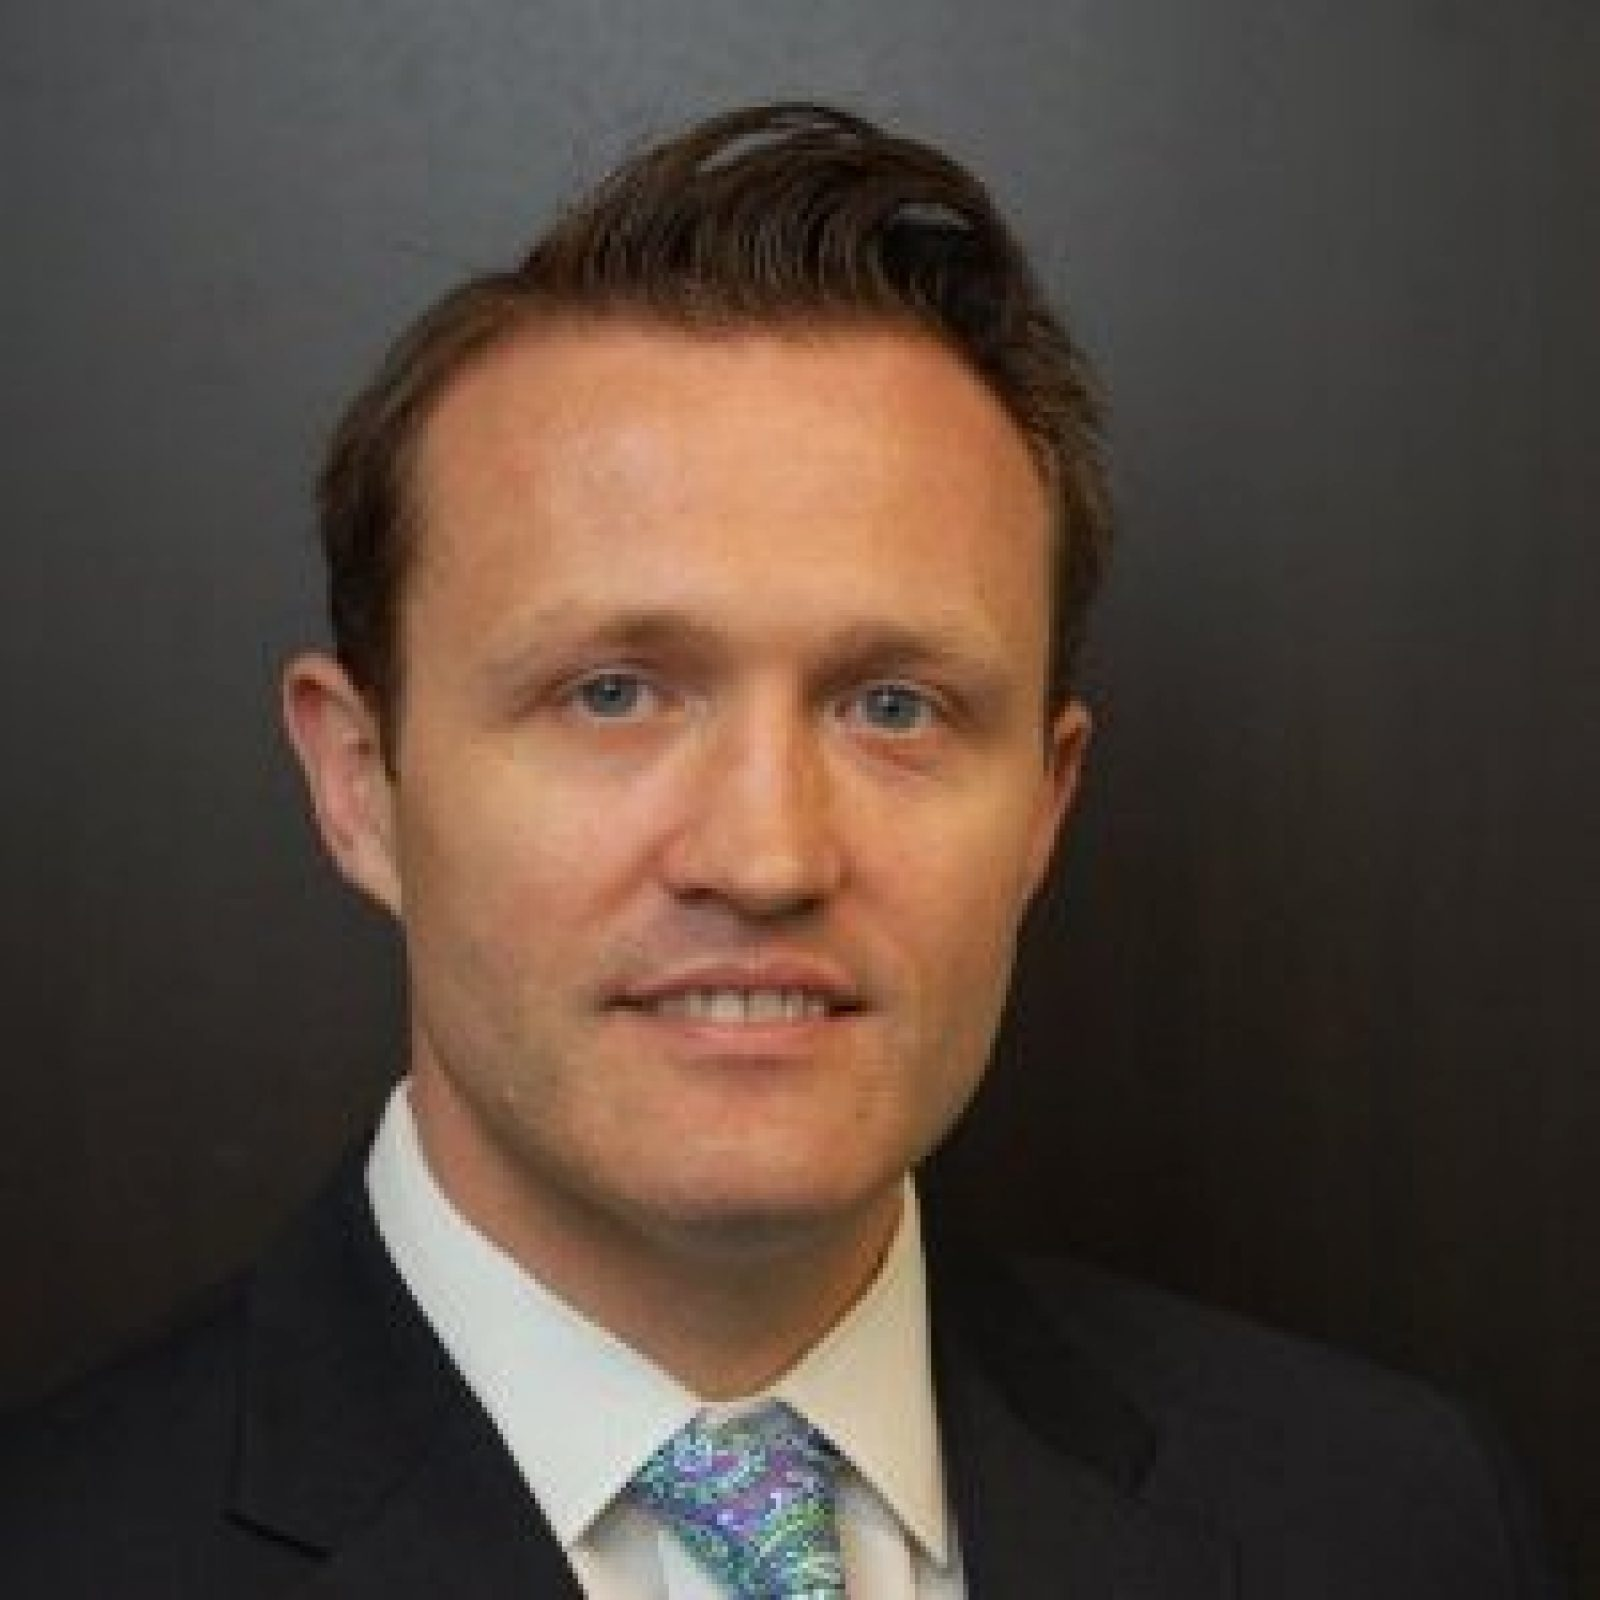 Kyle Nichols - Instructor, Certificate in Risk Management